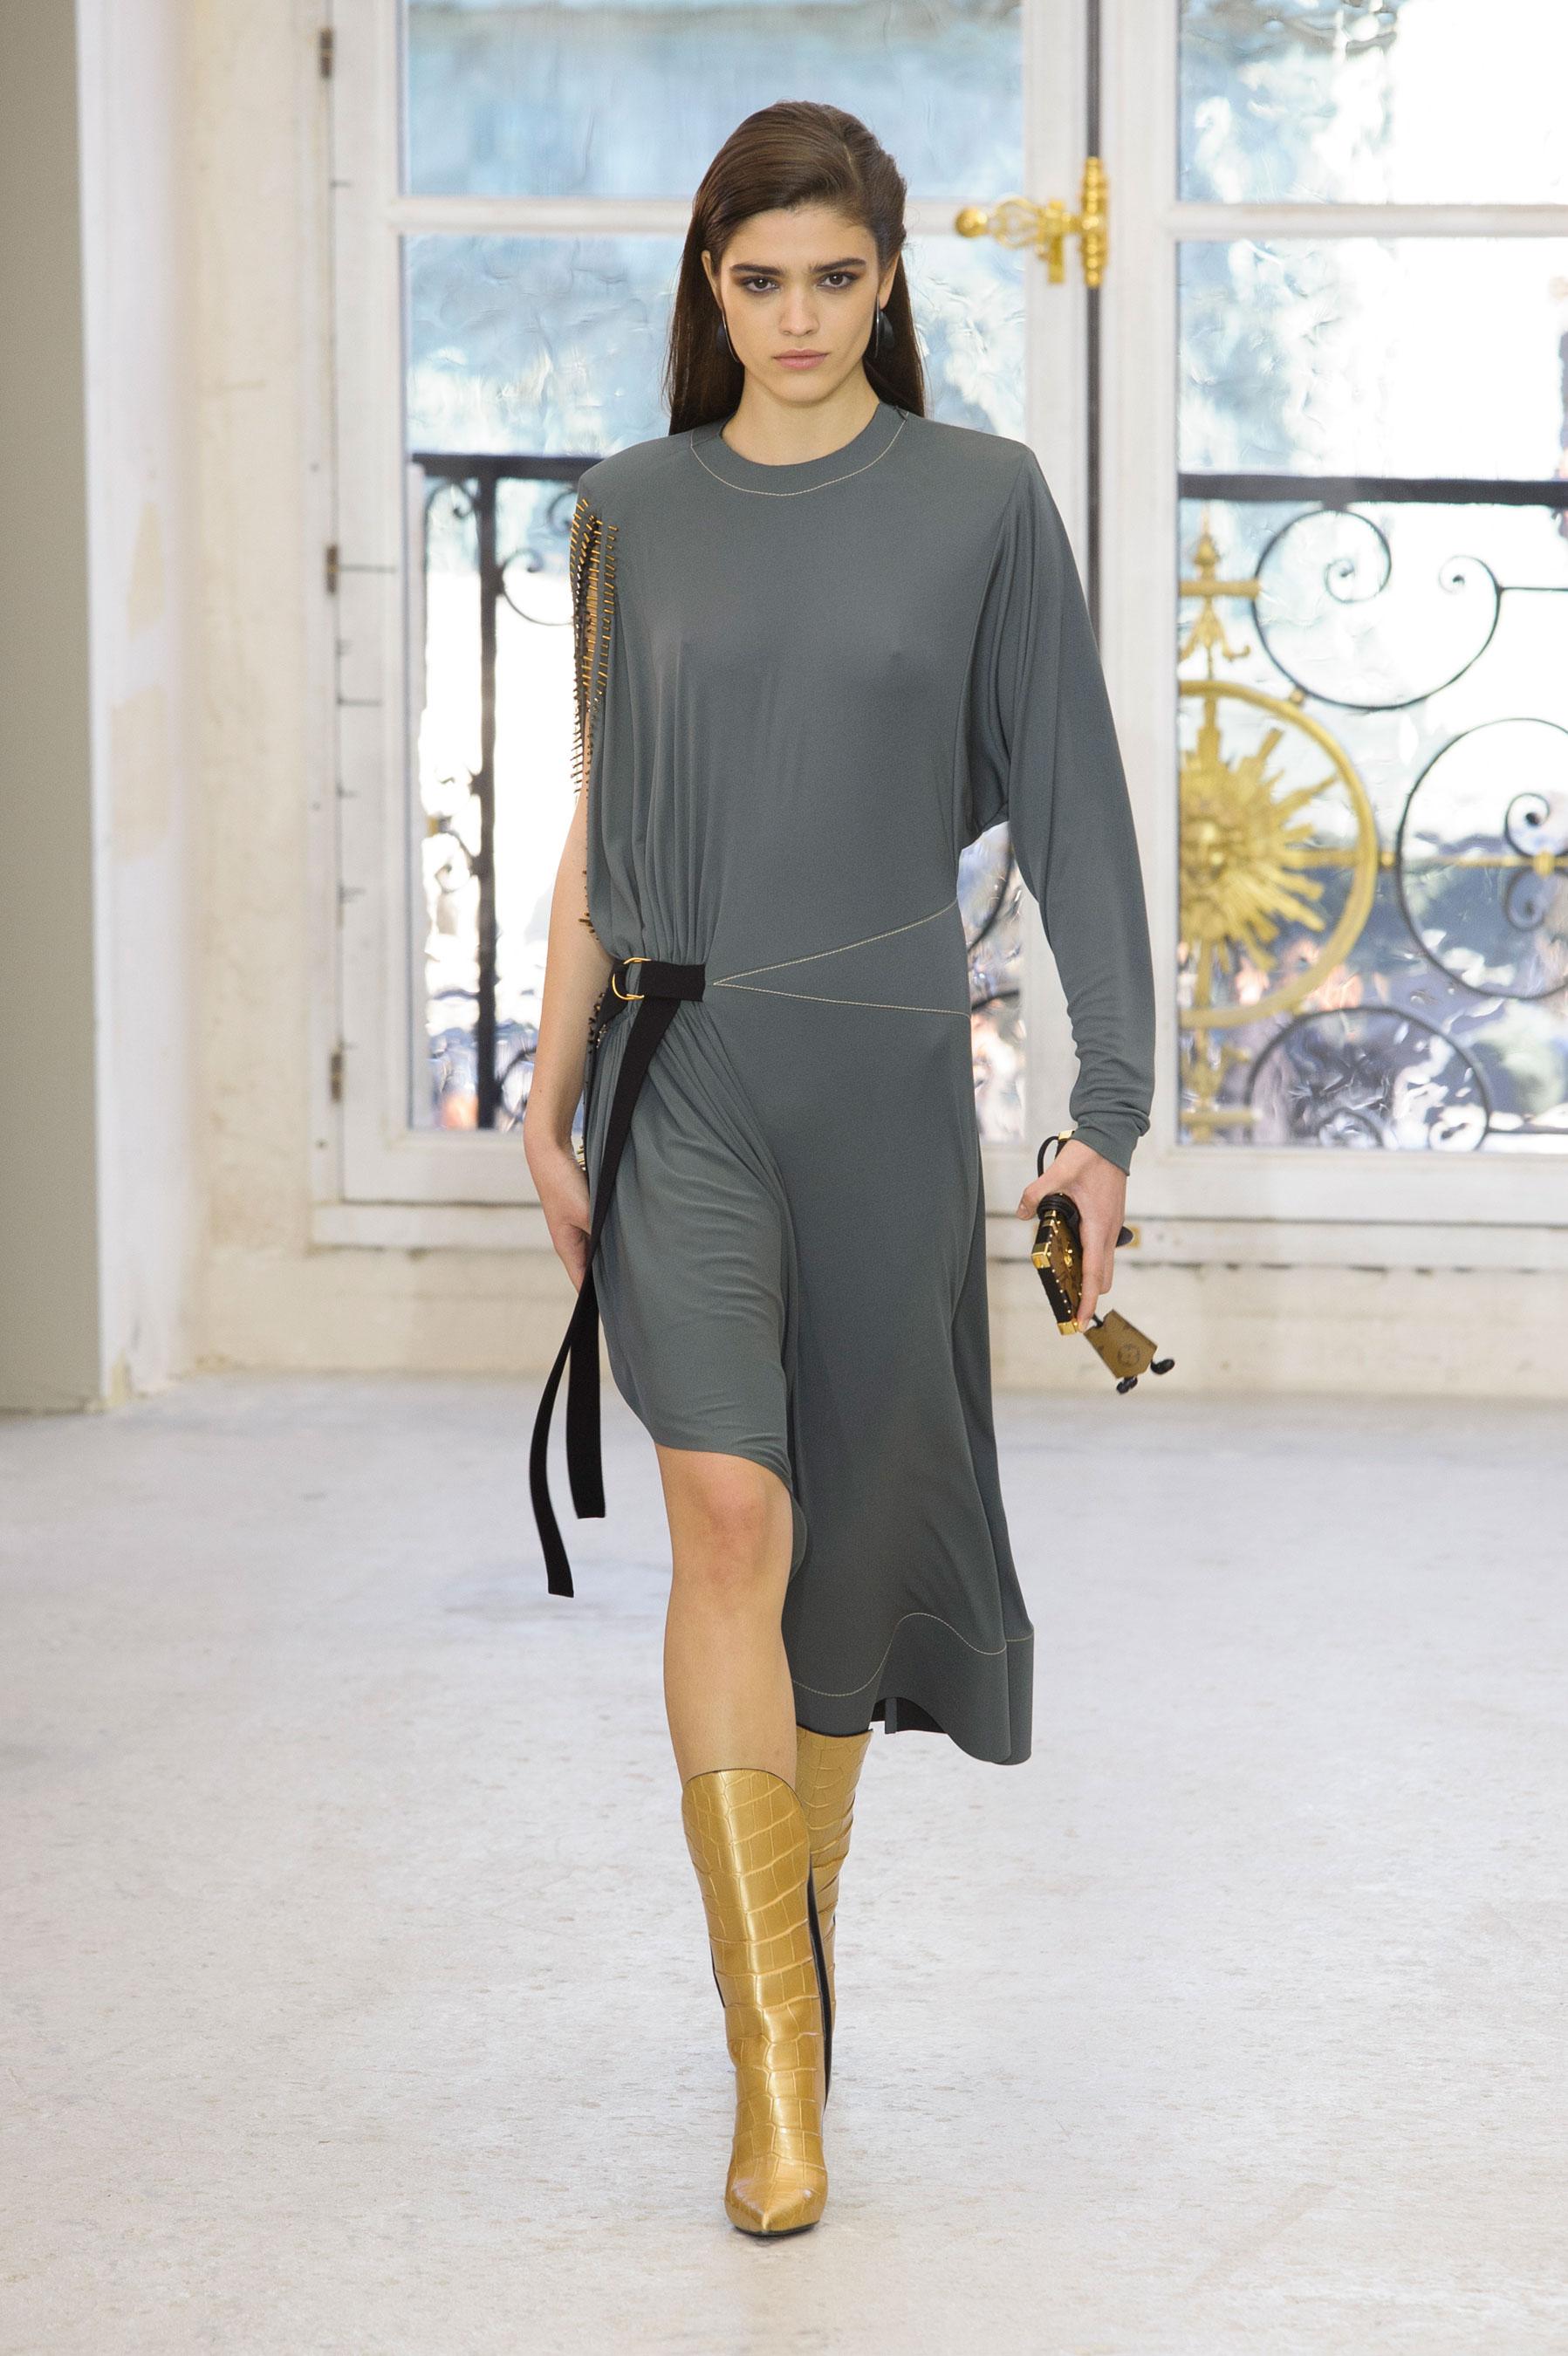 Vetements Party Paris Fashion Week